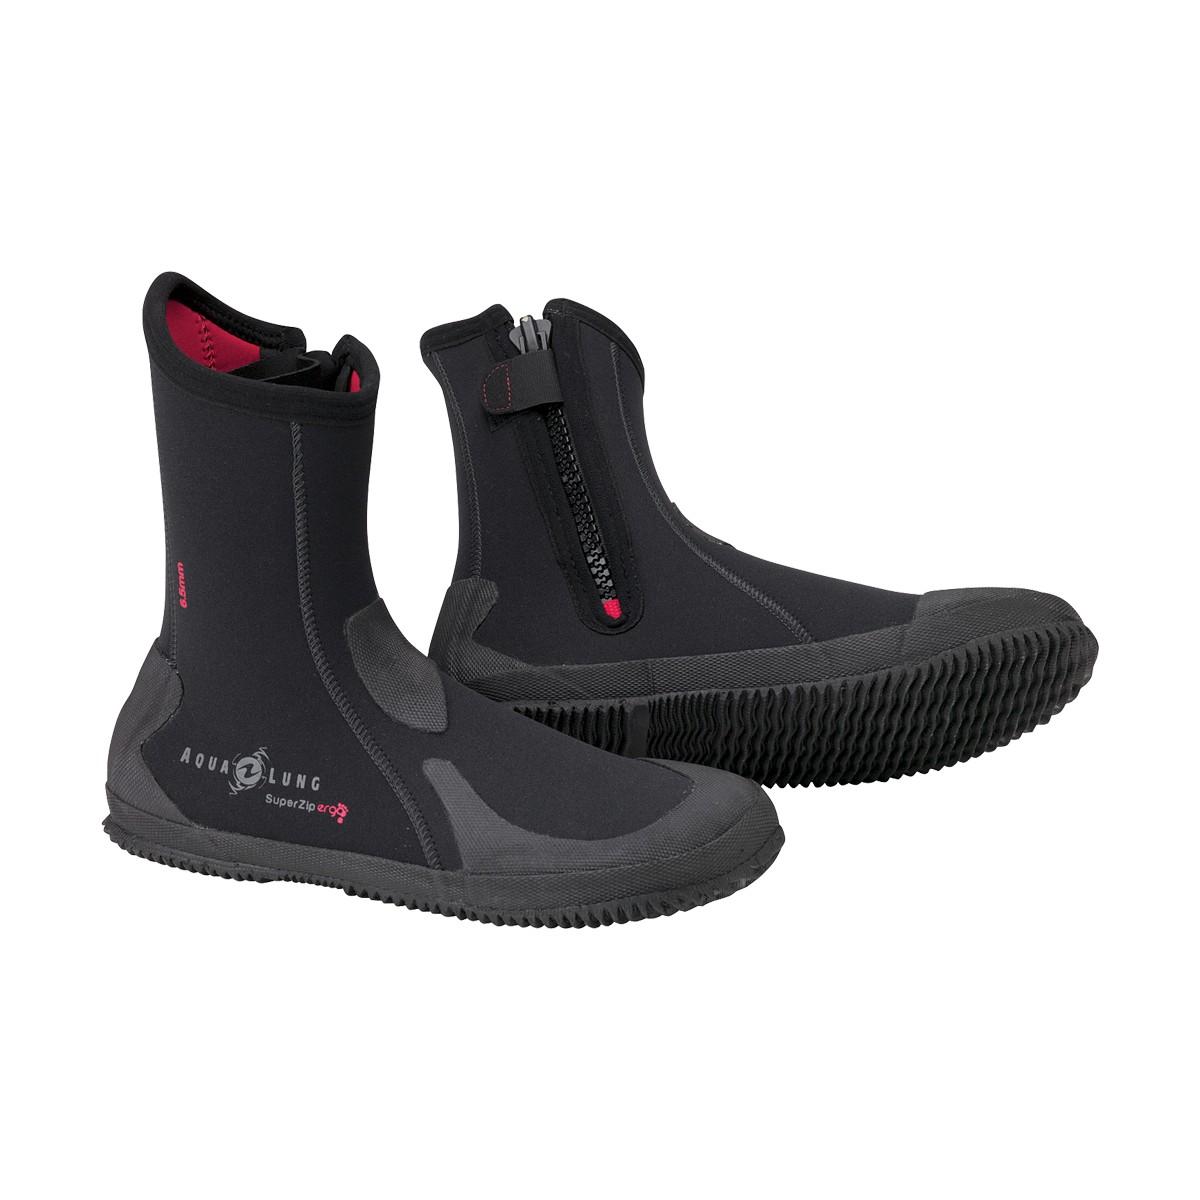 Aqua Lung Men's 3mm Superzip Ergo Boot